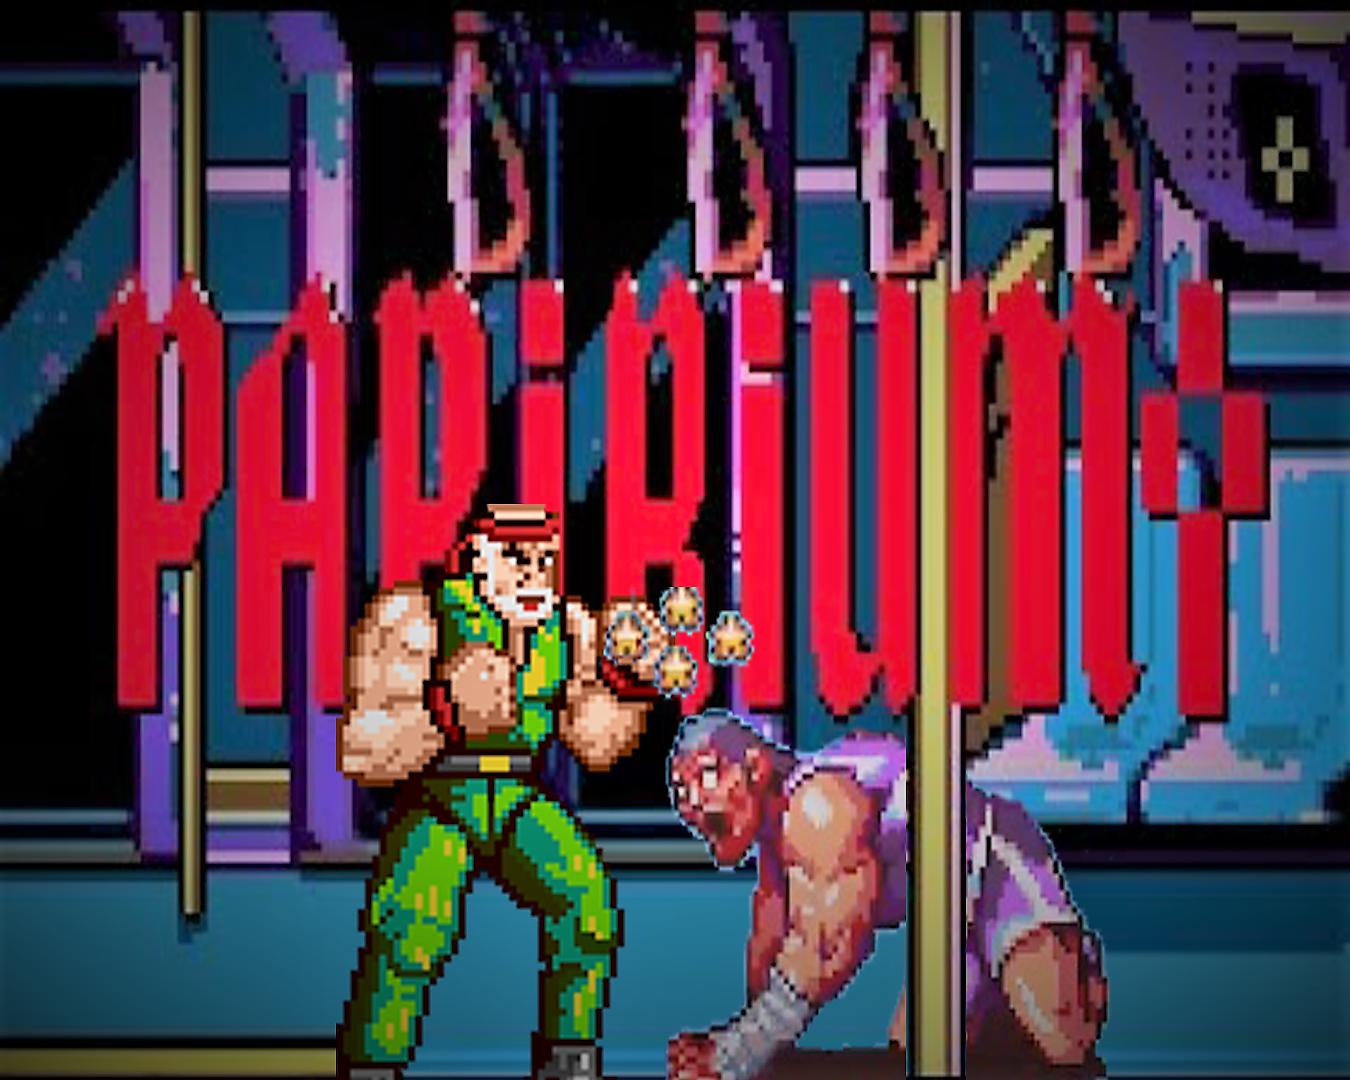 Out of the ashes of Paprium, Rises PapiRium!